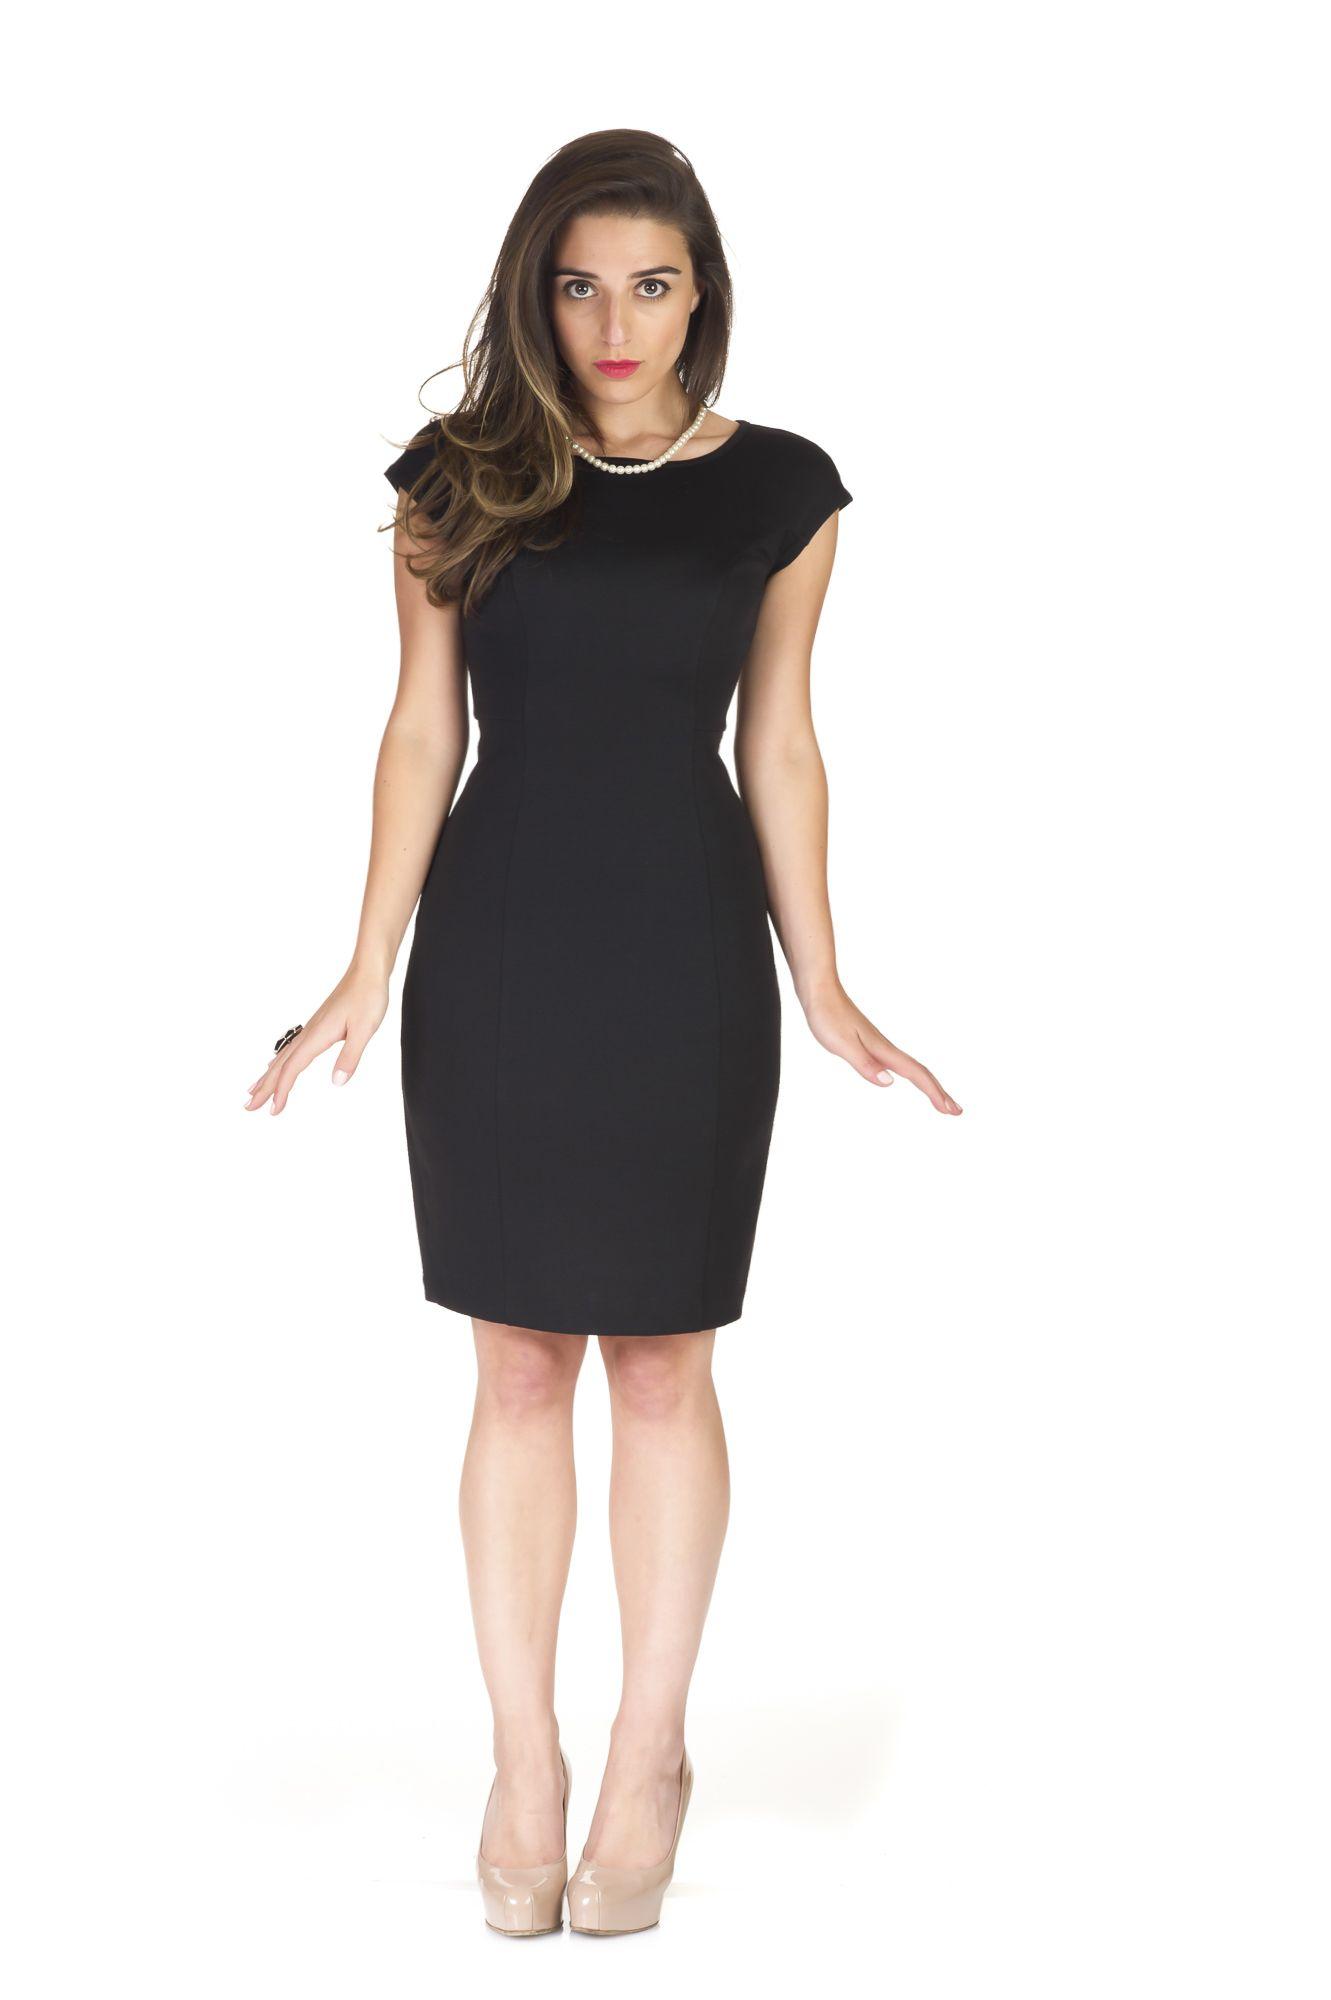 Women S Dresses Walmart Com Womens Dresses Dresses Jumpsuit Dress [ 2000 x 1331 Pixel ]